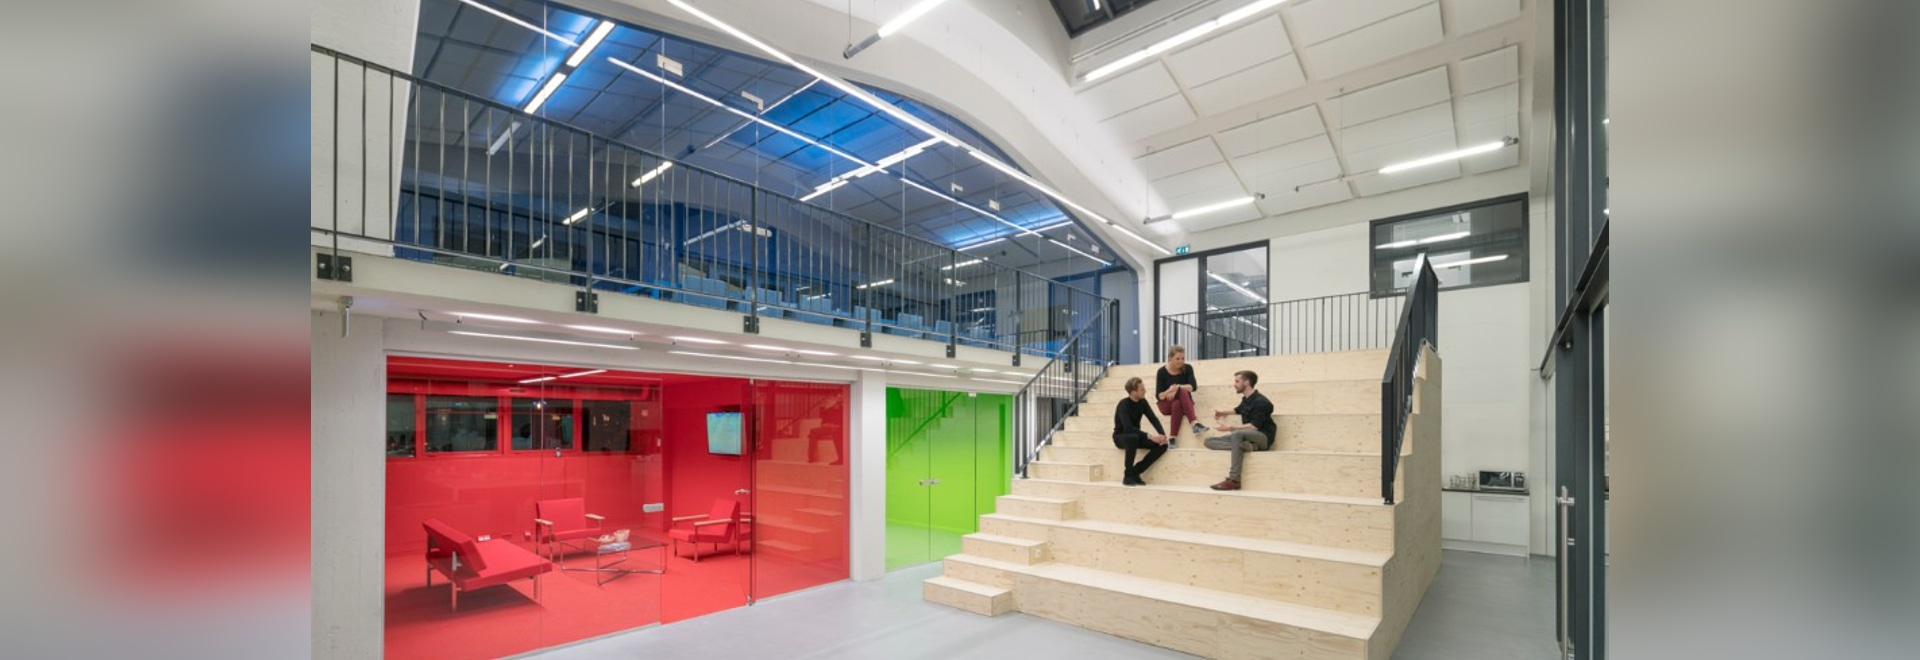 MVRDV-Haus - Rotterdam, Netherlands